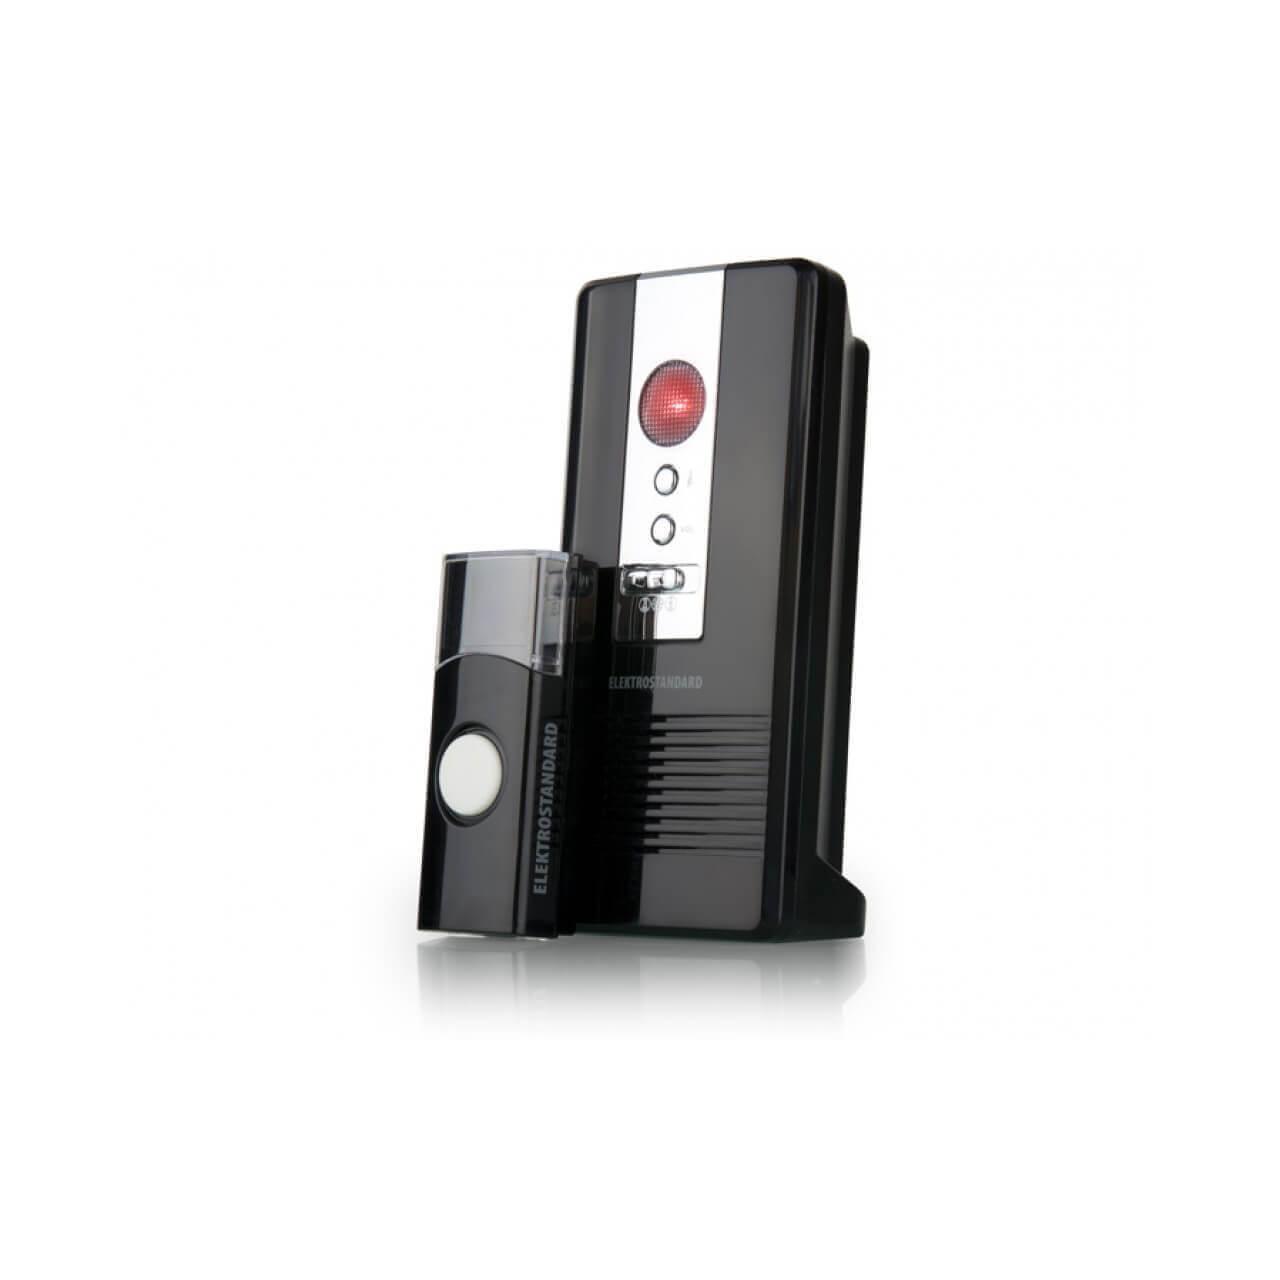 Звонок беспроводной Elektrostandard DBQ06M WL 36M IP44 черный 4690389031236